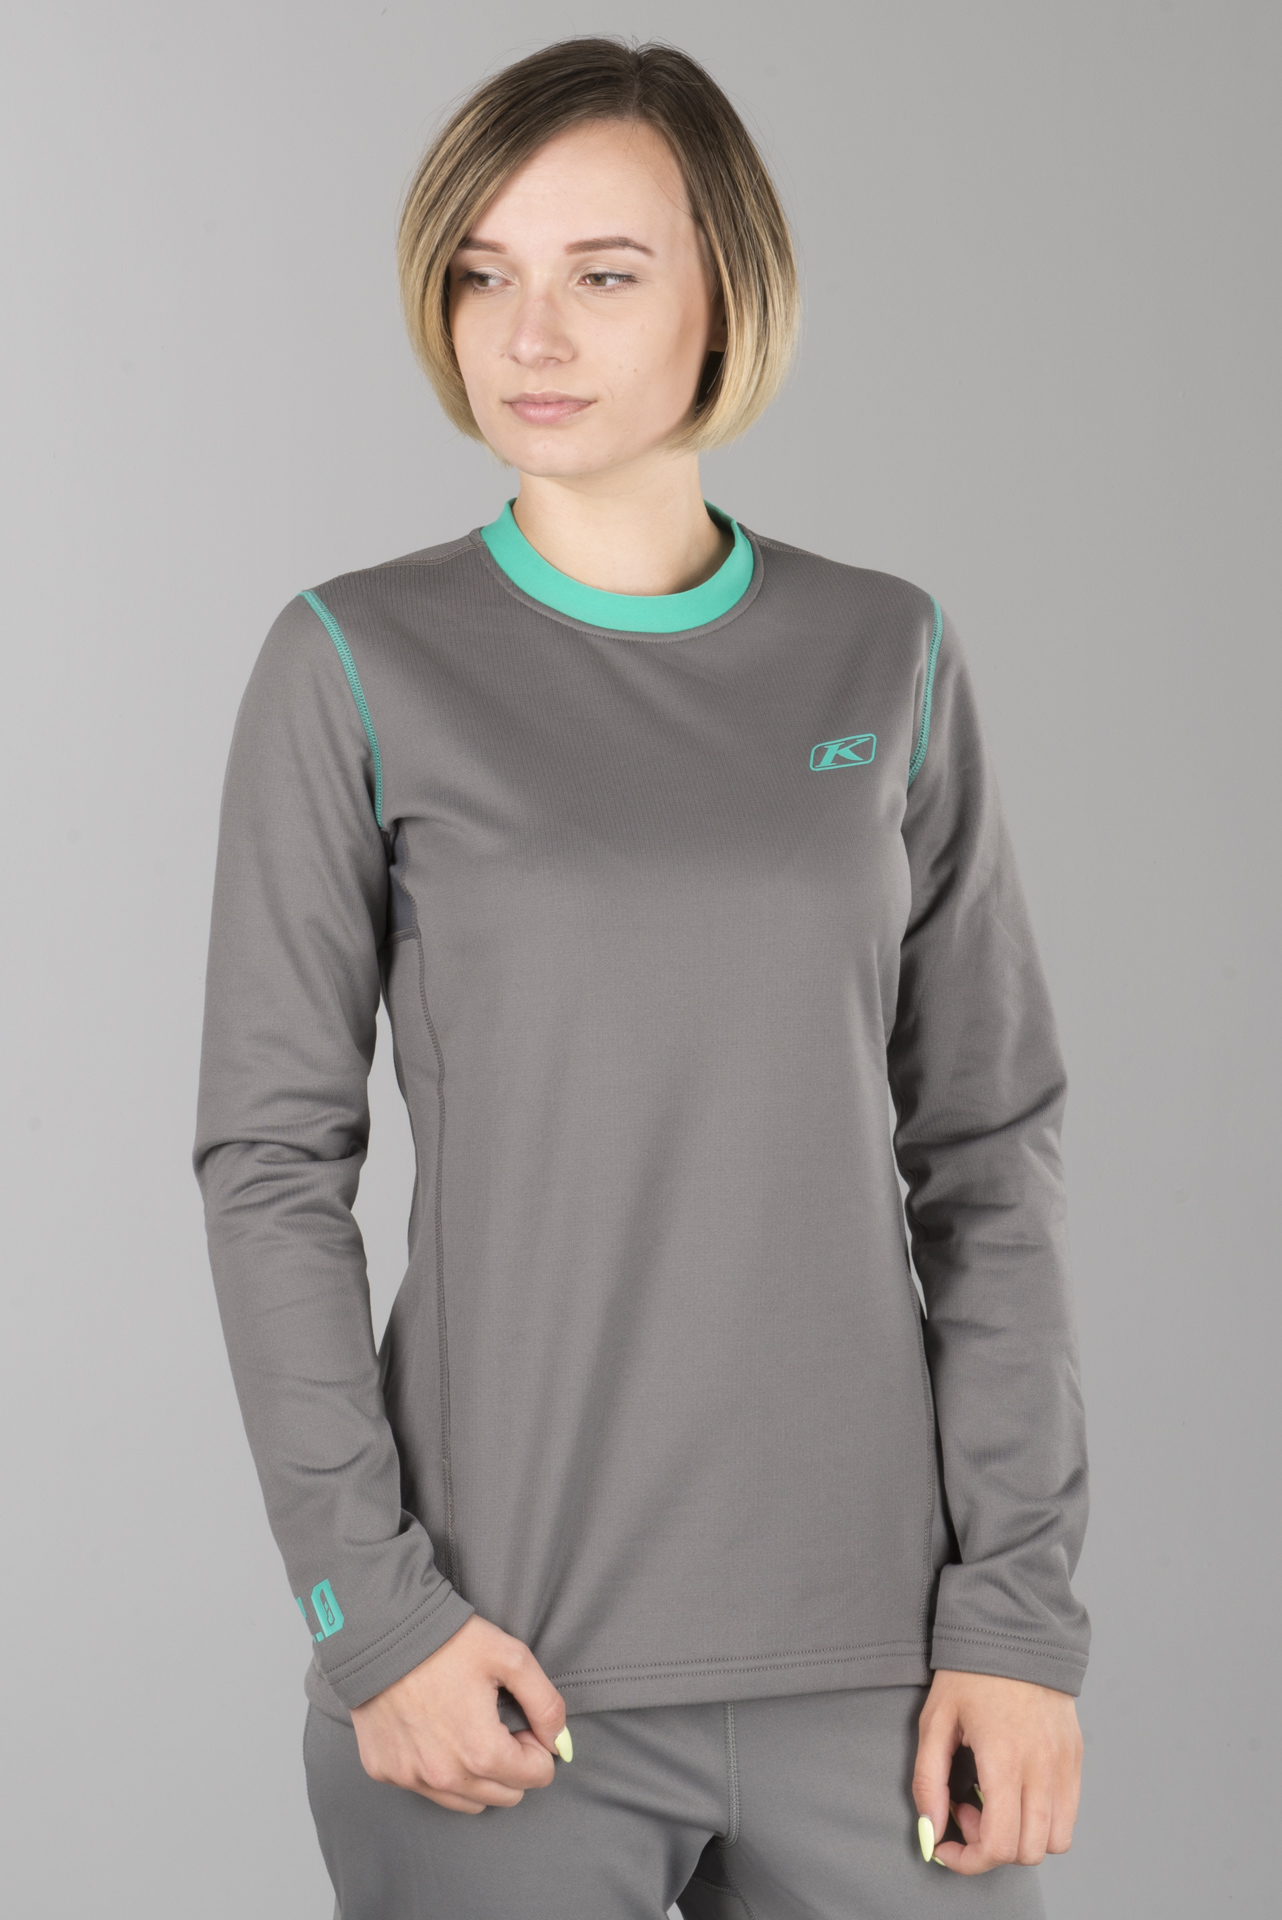 XL, Black Klim Women/'s Solstice Shirt 2.0